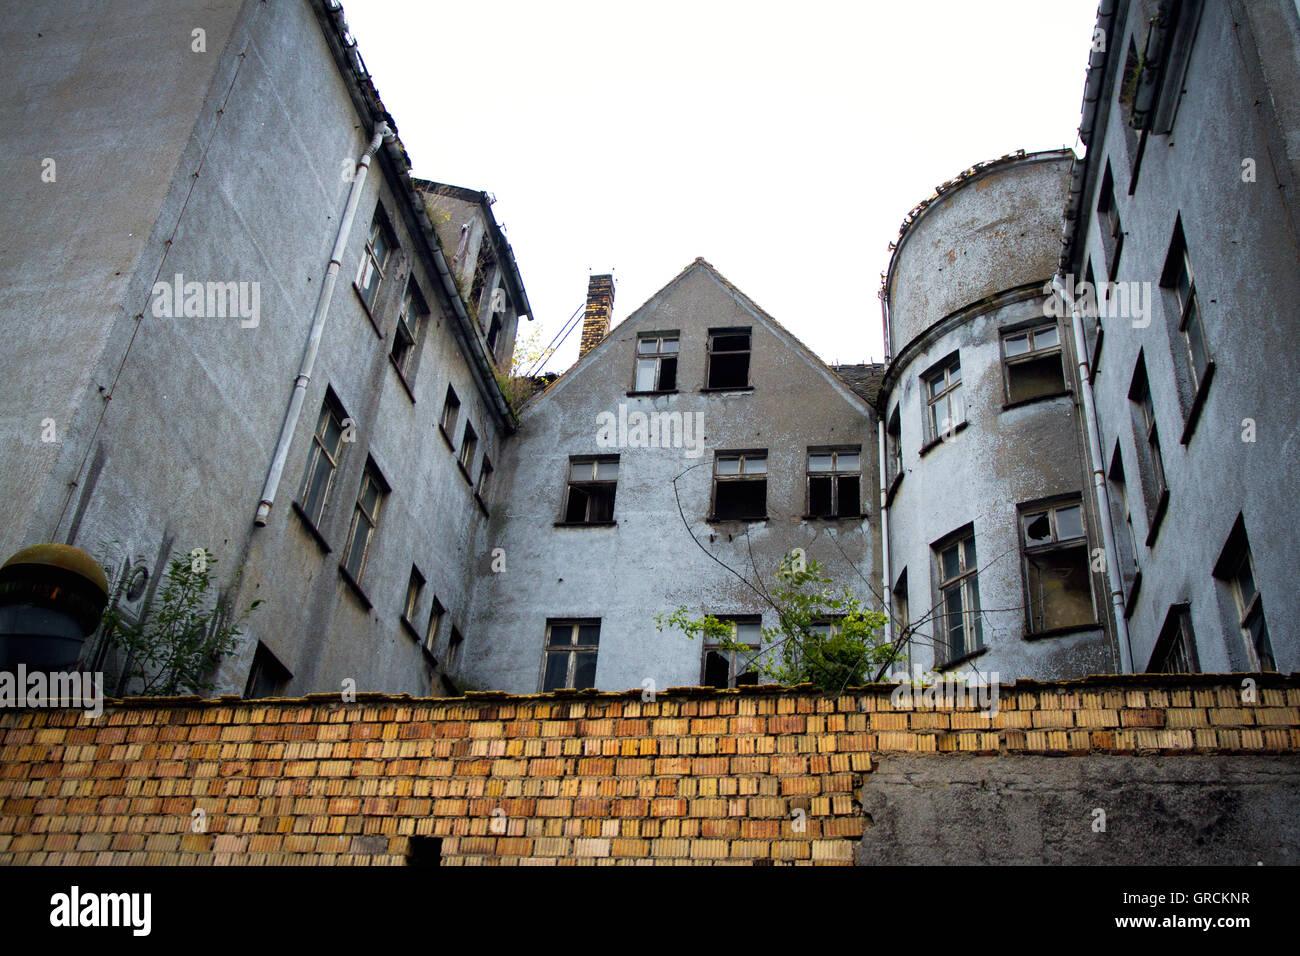 Urbanity, Old Building, Vacancy Stock Photo